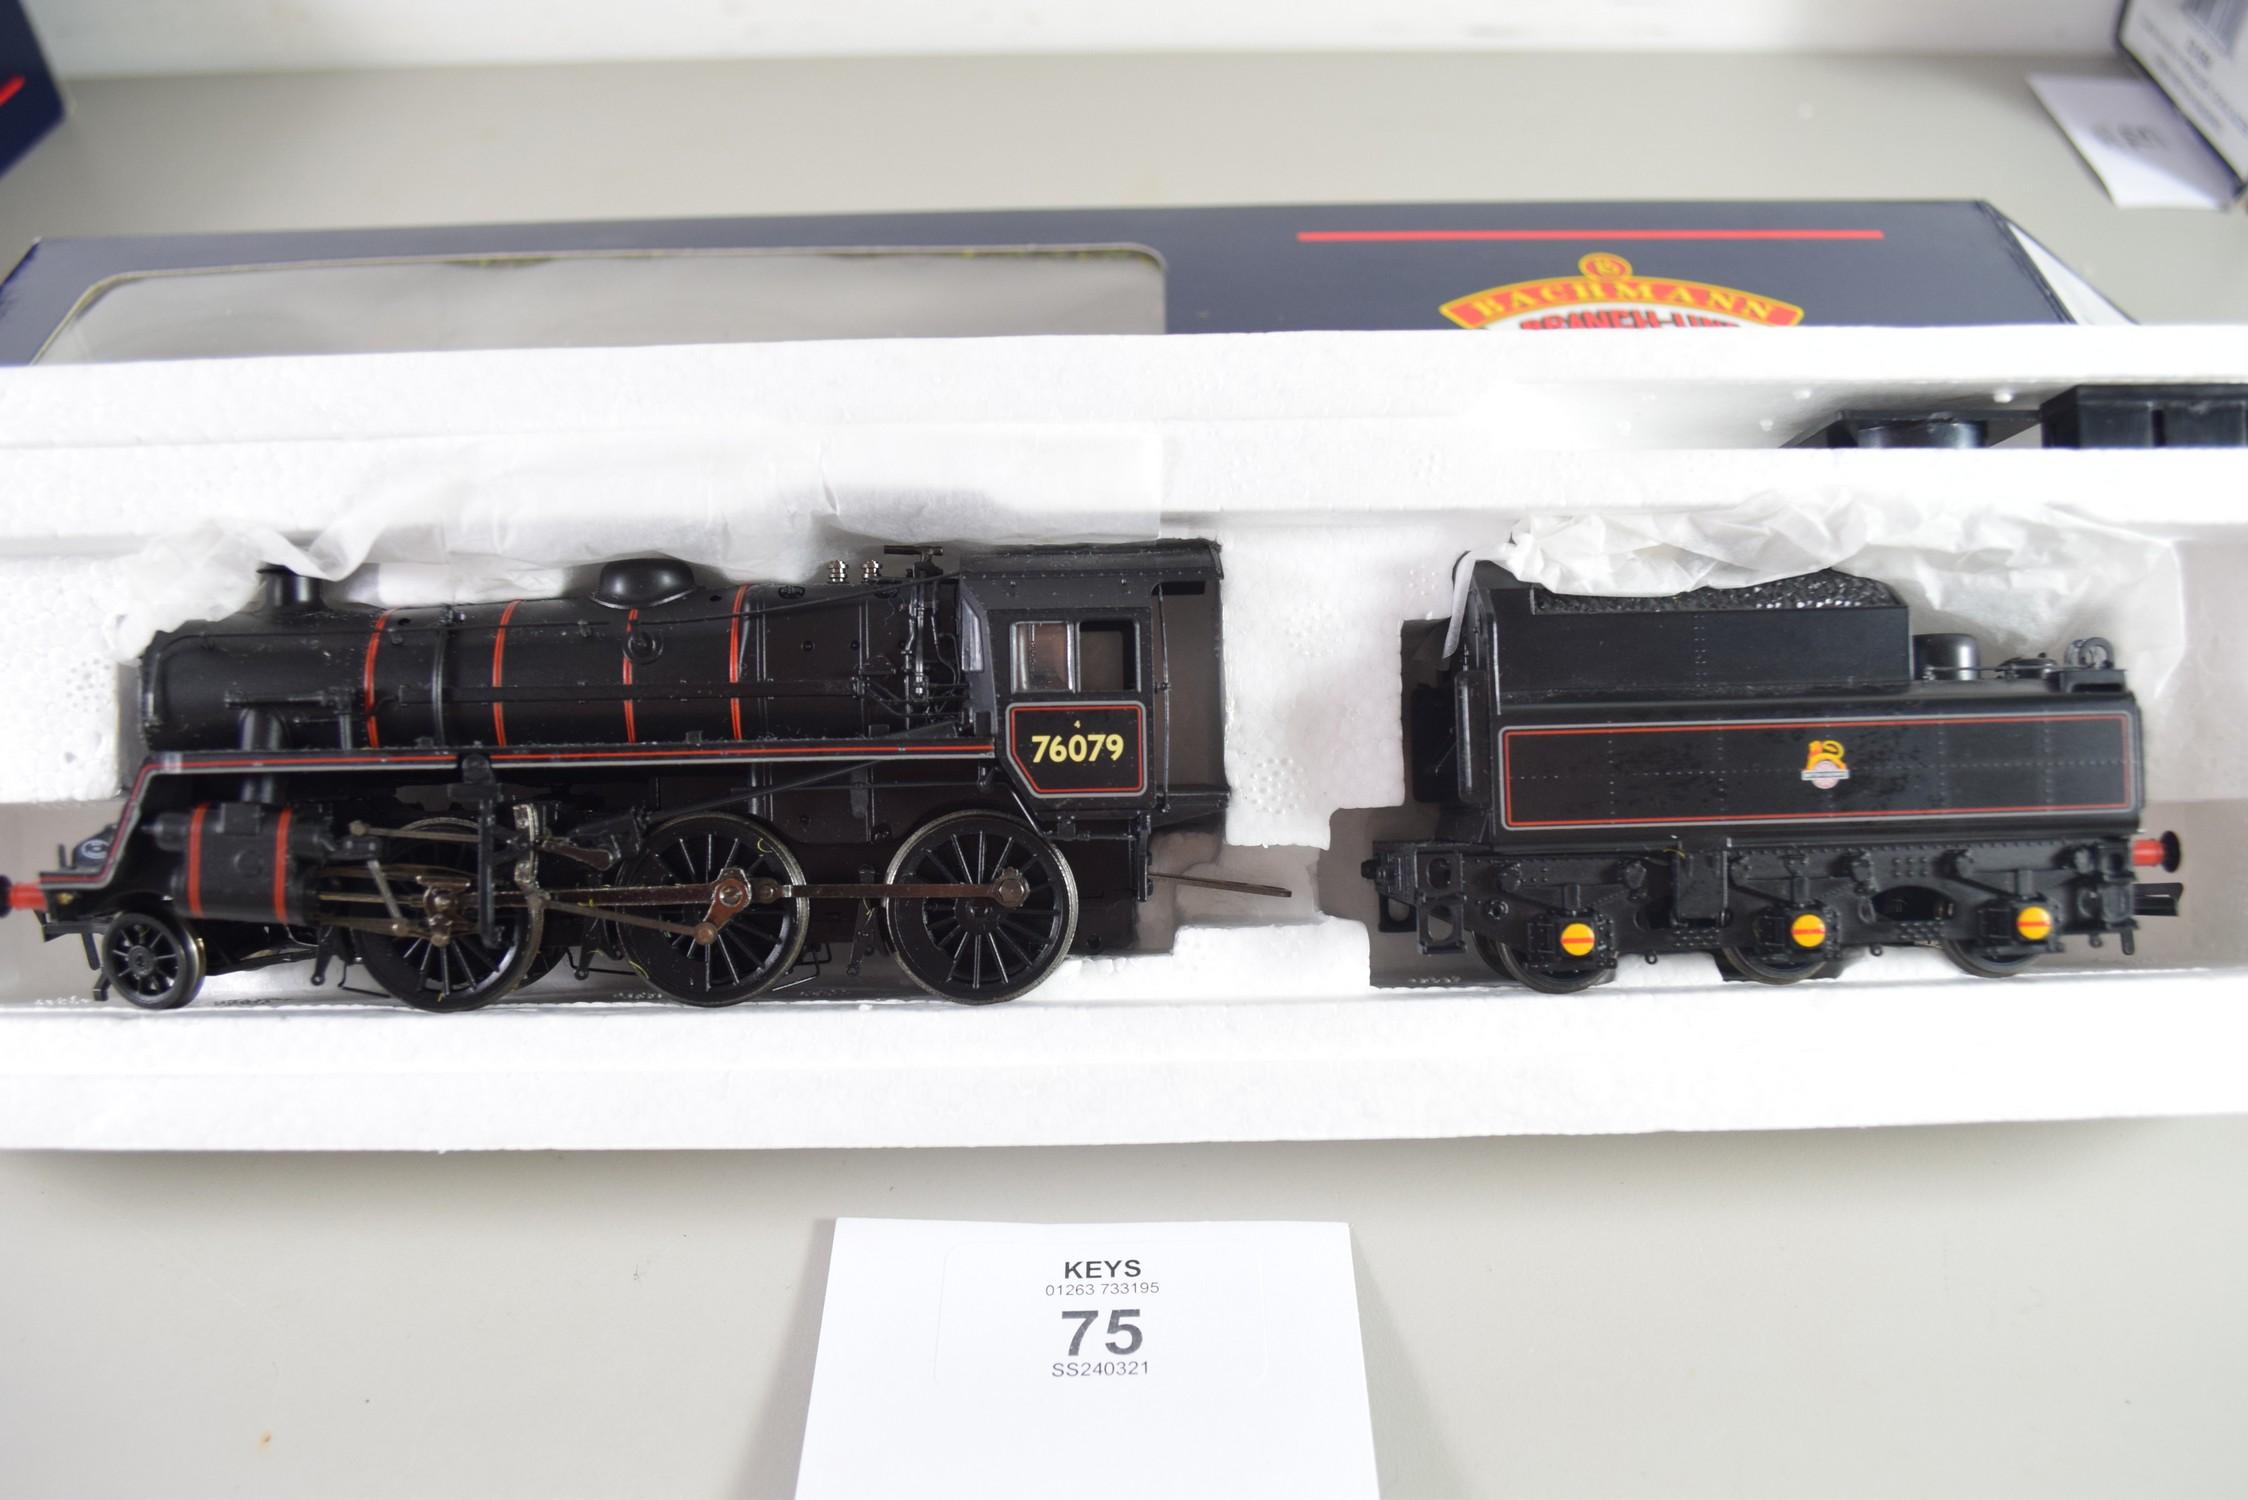 Boxed Bachmann 00 gauge 32-952A Standard class 4MT 2-6-0 BR2 tender, e-emblem, No 76079 locomotive - Image 2 of 2